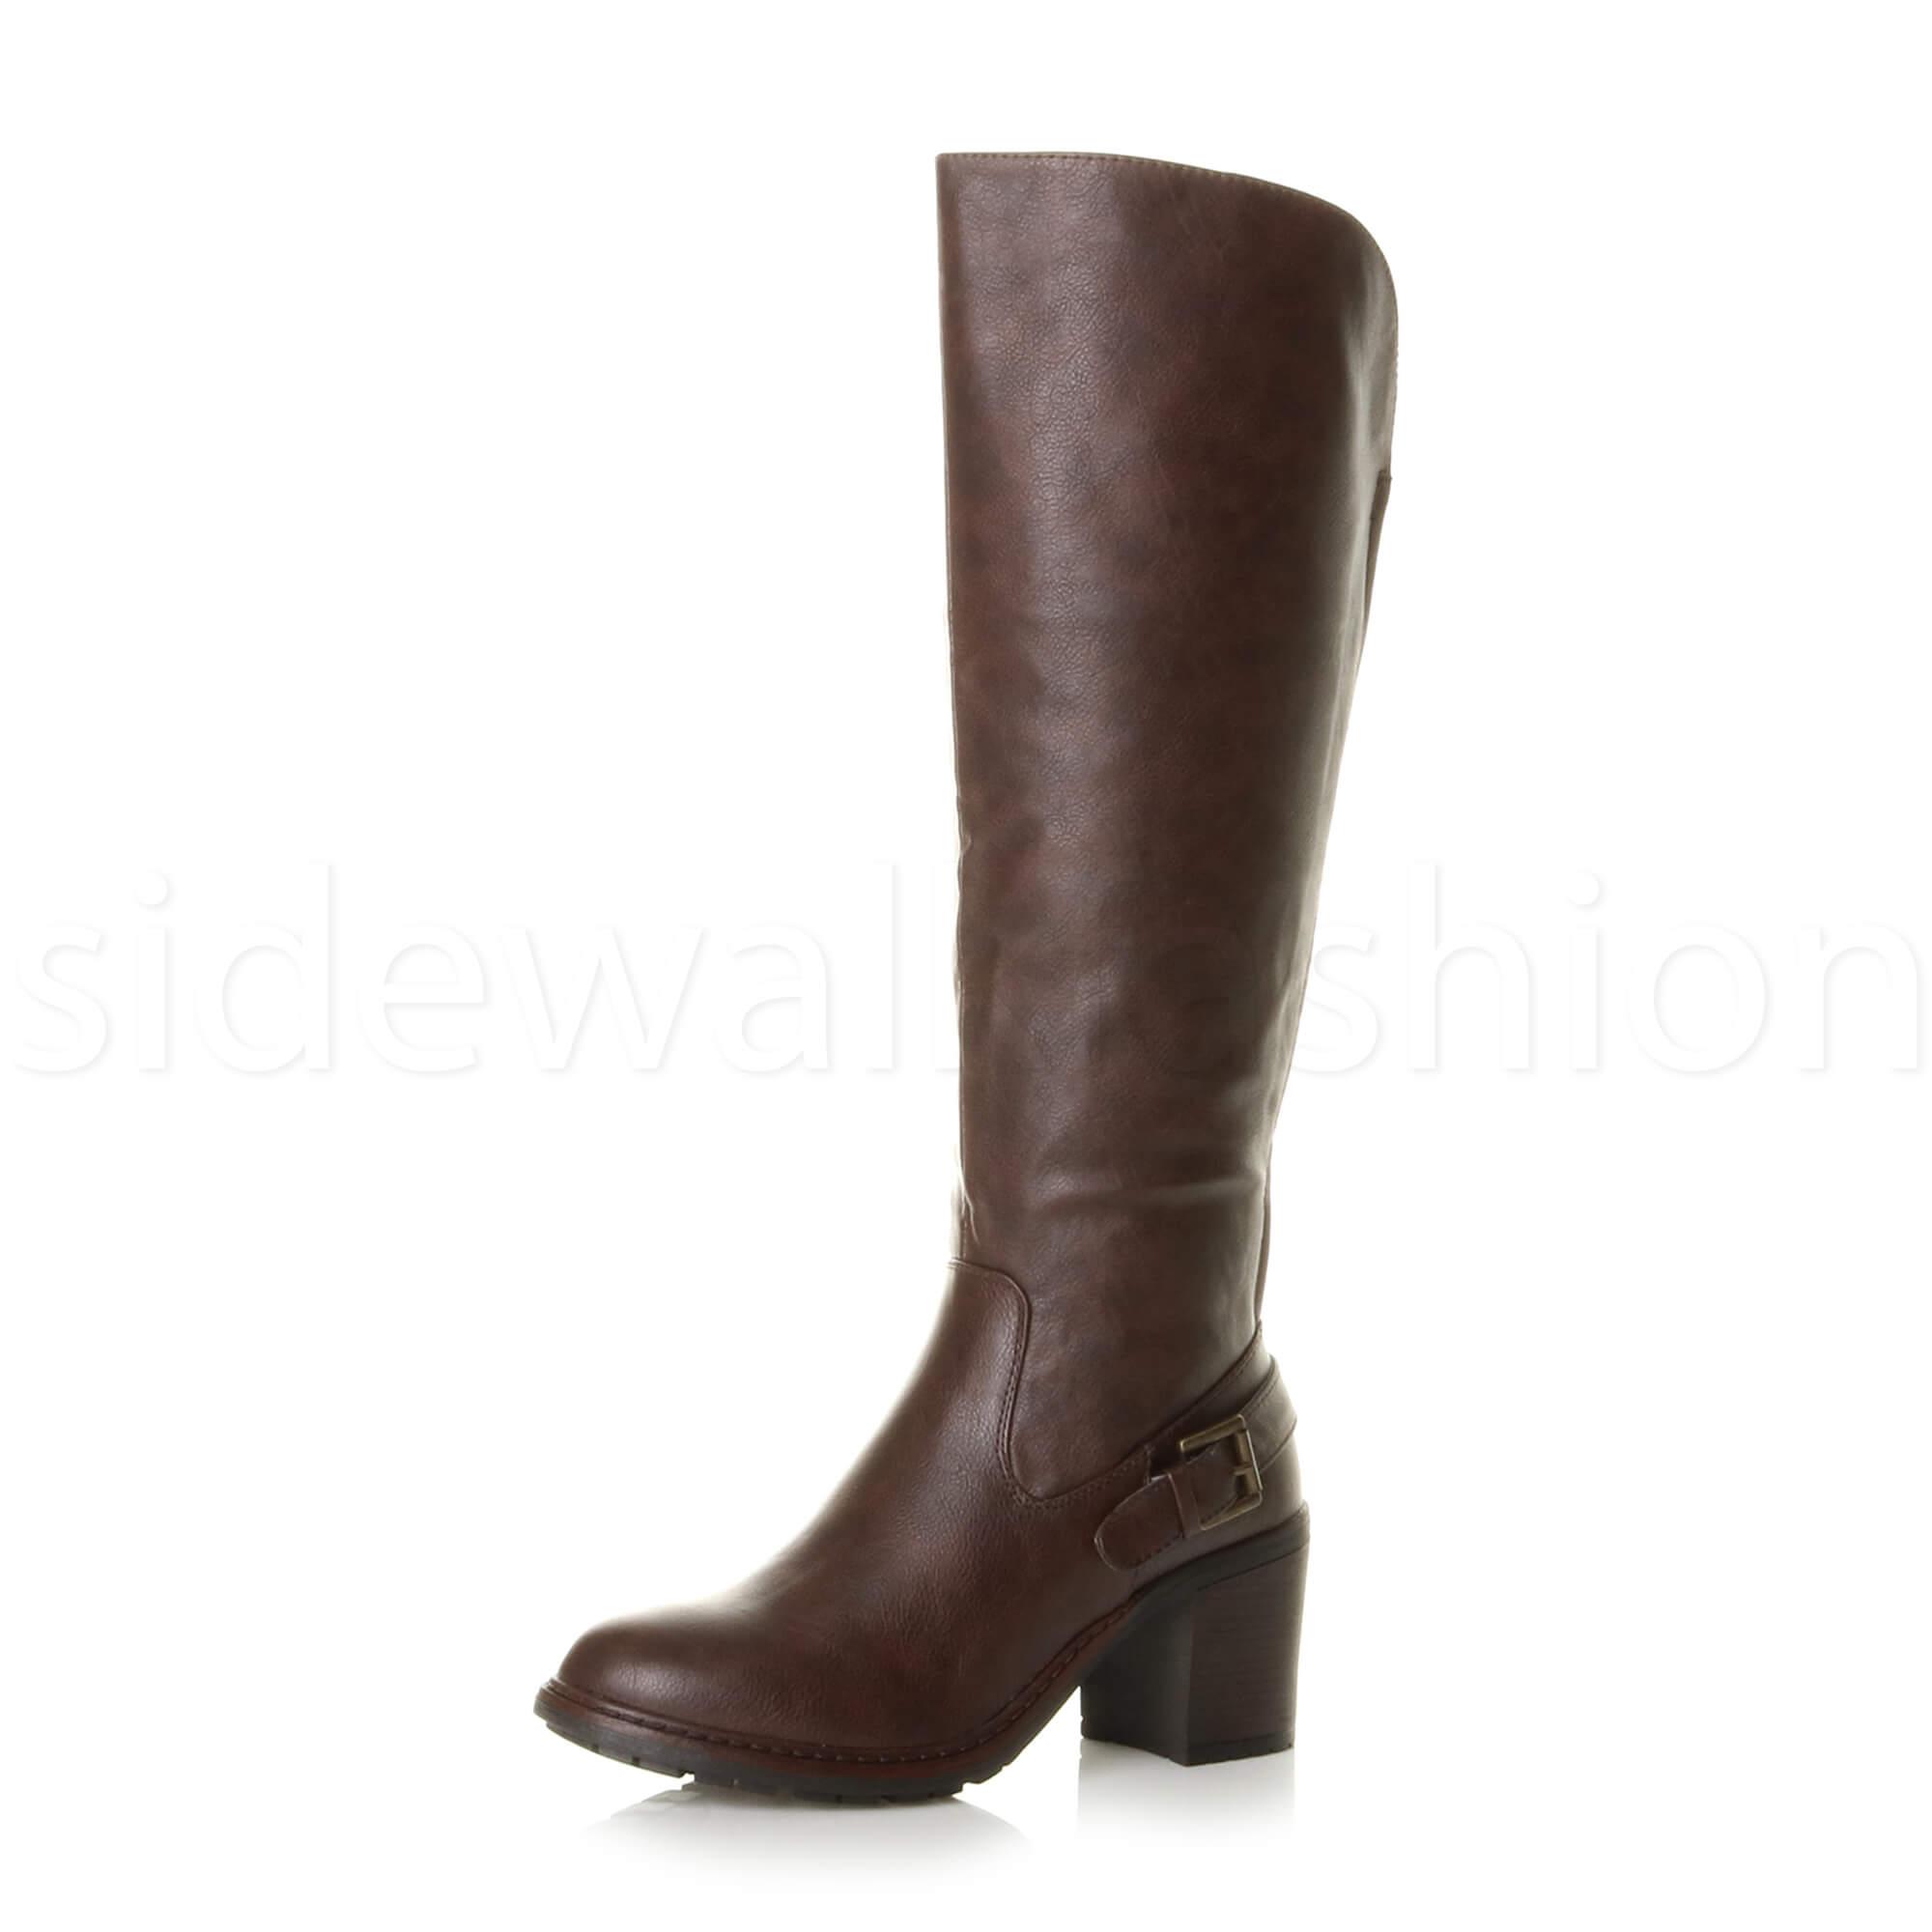 ebe95154bd9c Details about Womens ladies block high heel wide calf zip stretch biker  riding knee boots size